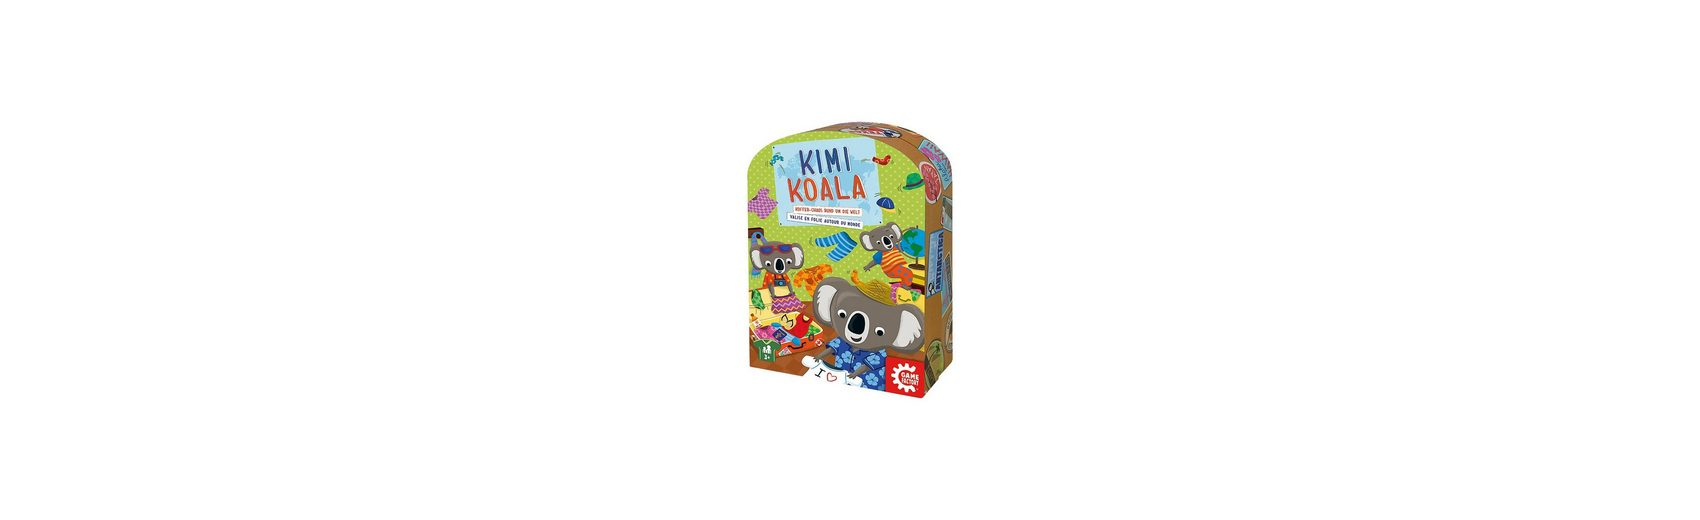 Gamesfactory Kimi Koala